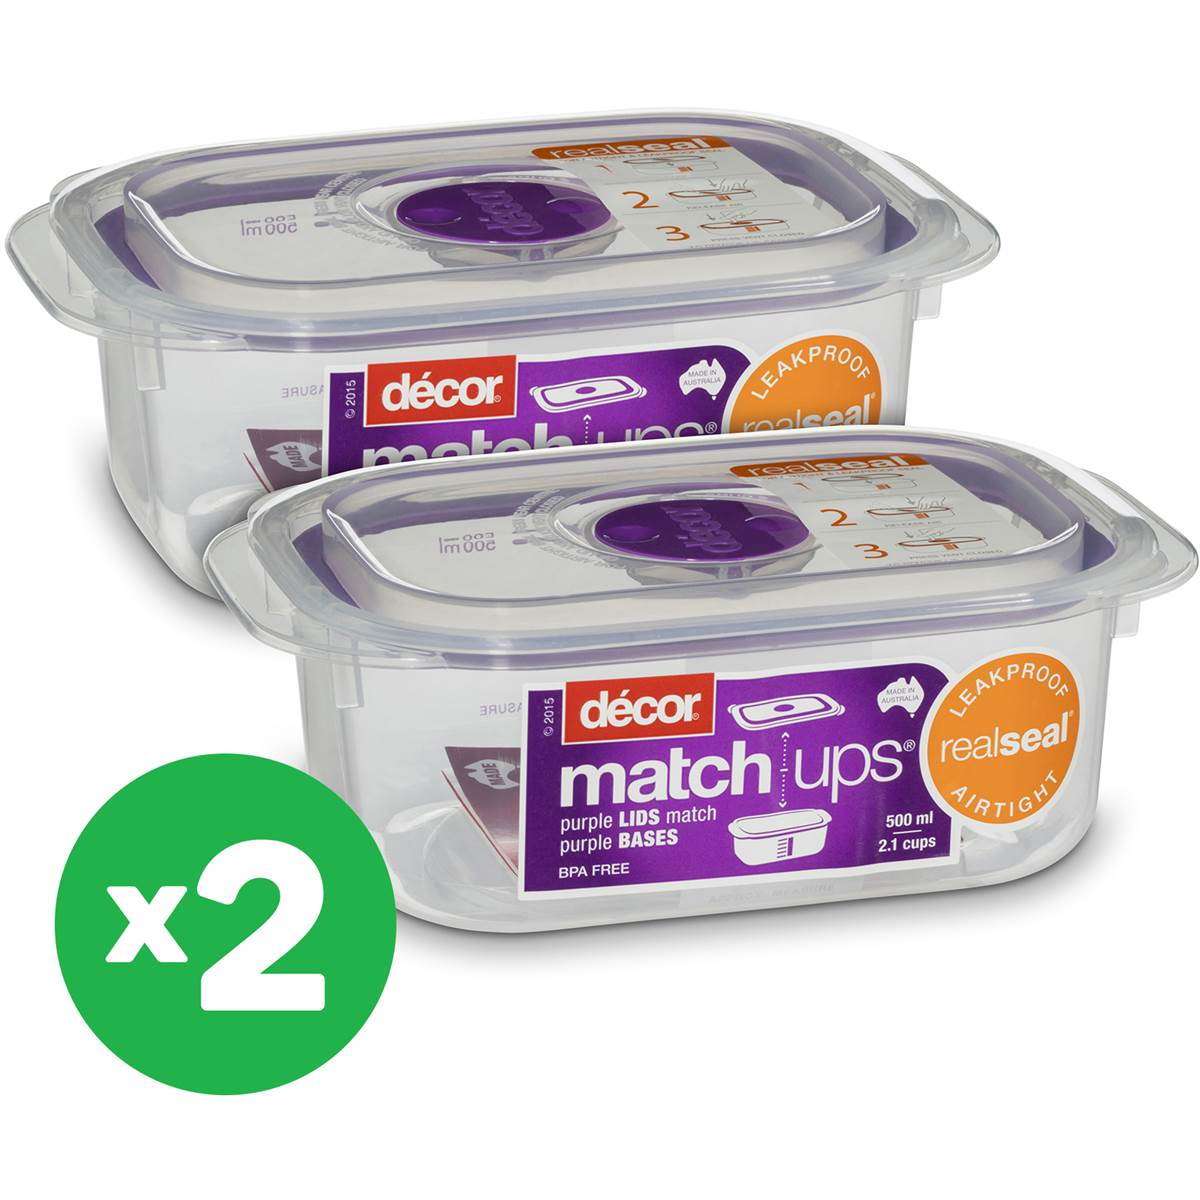 Decor match ups oblong food storage 500ml x2 bundle for Decor 500ml container